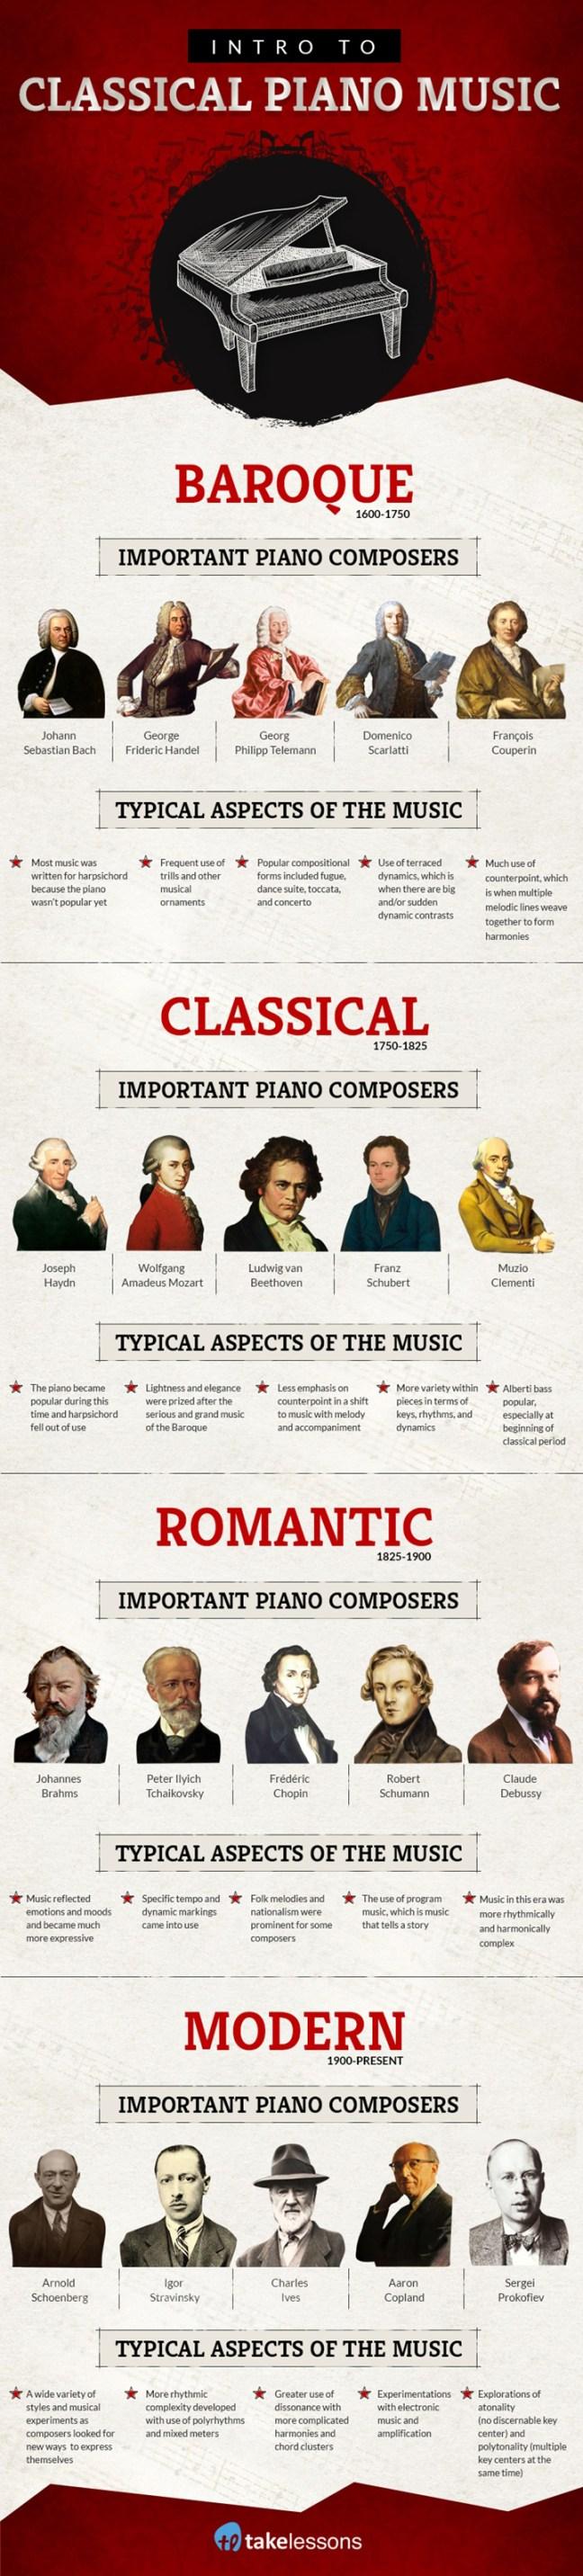 Intro to Classical Piano